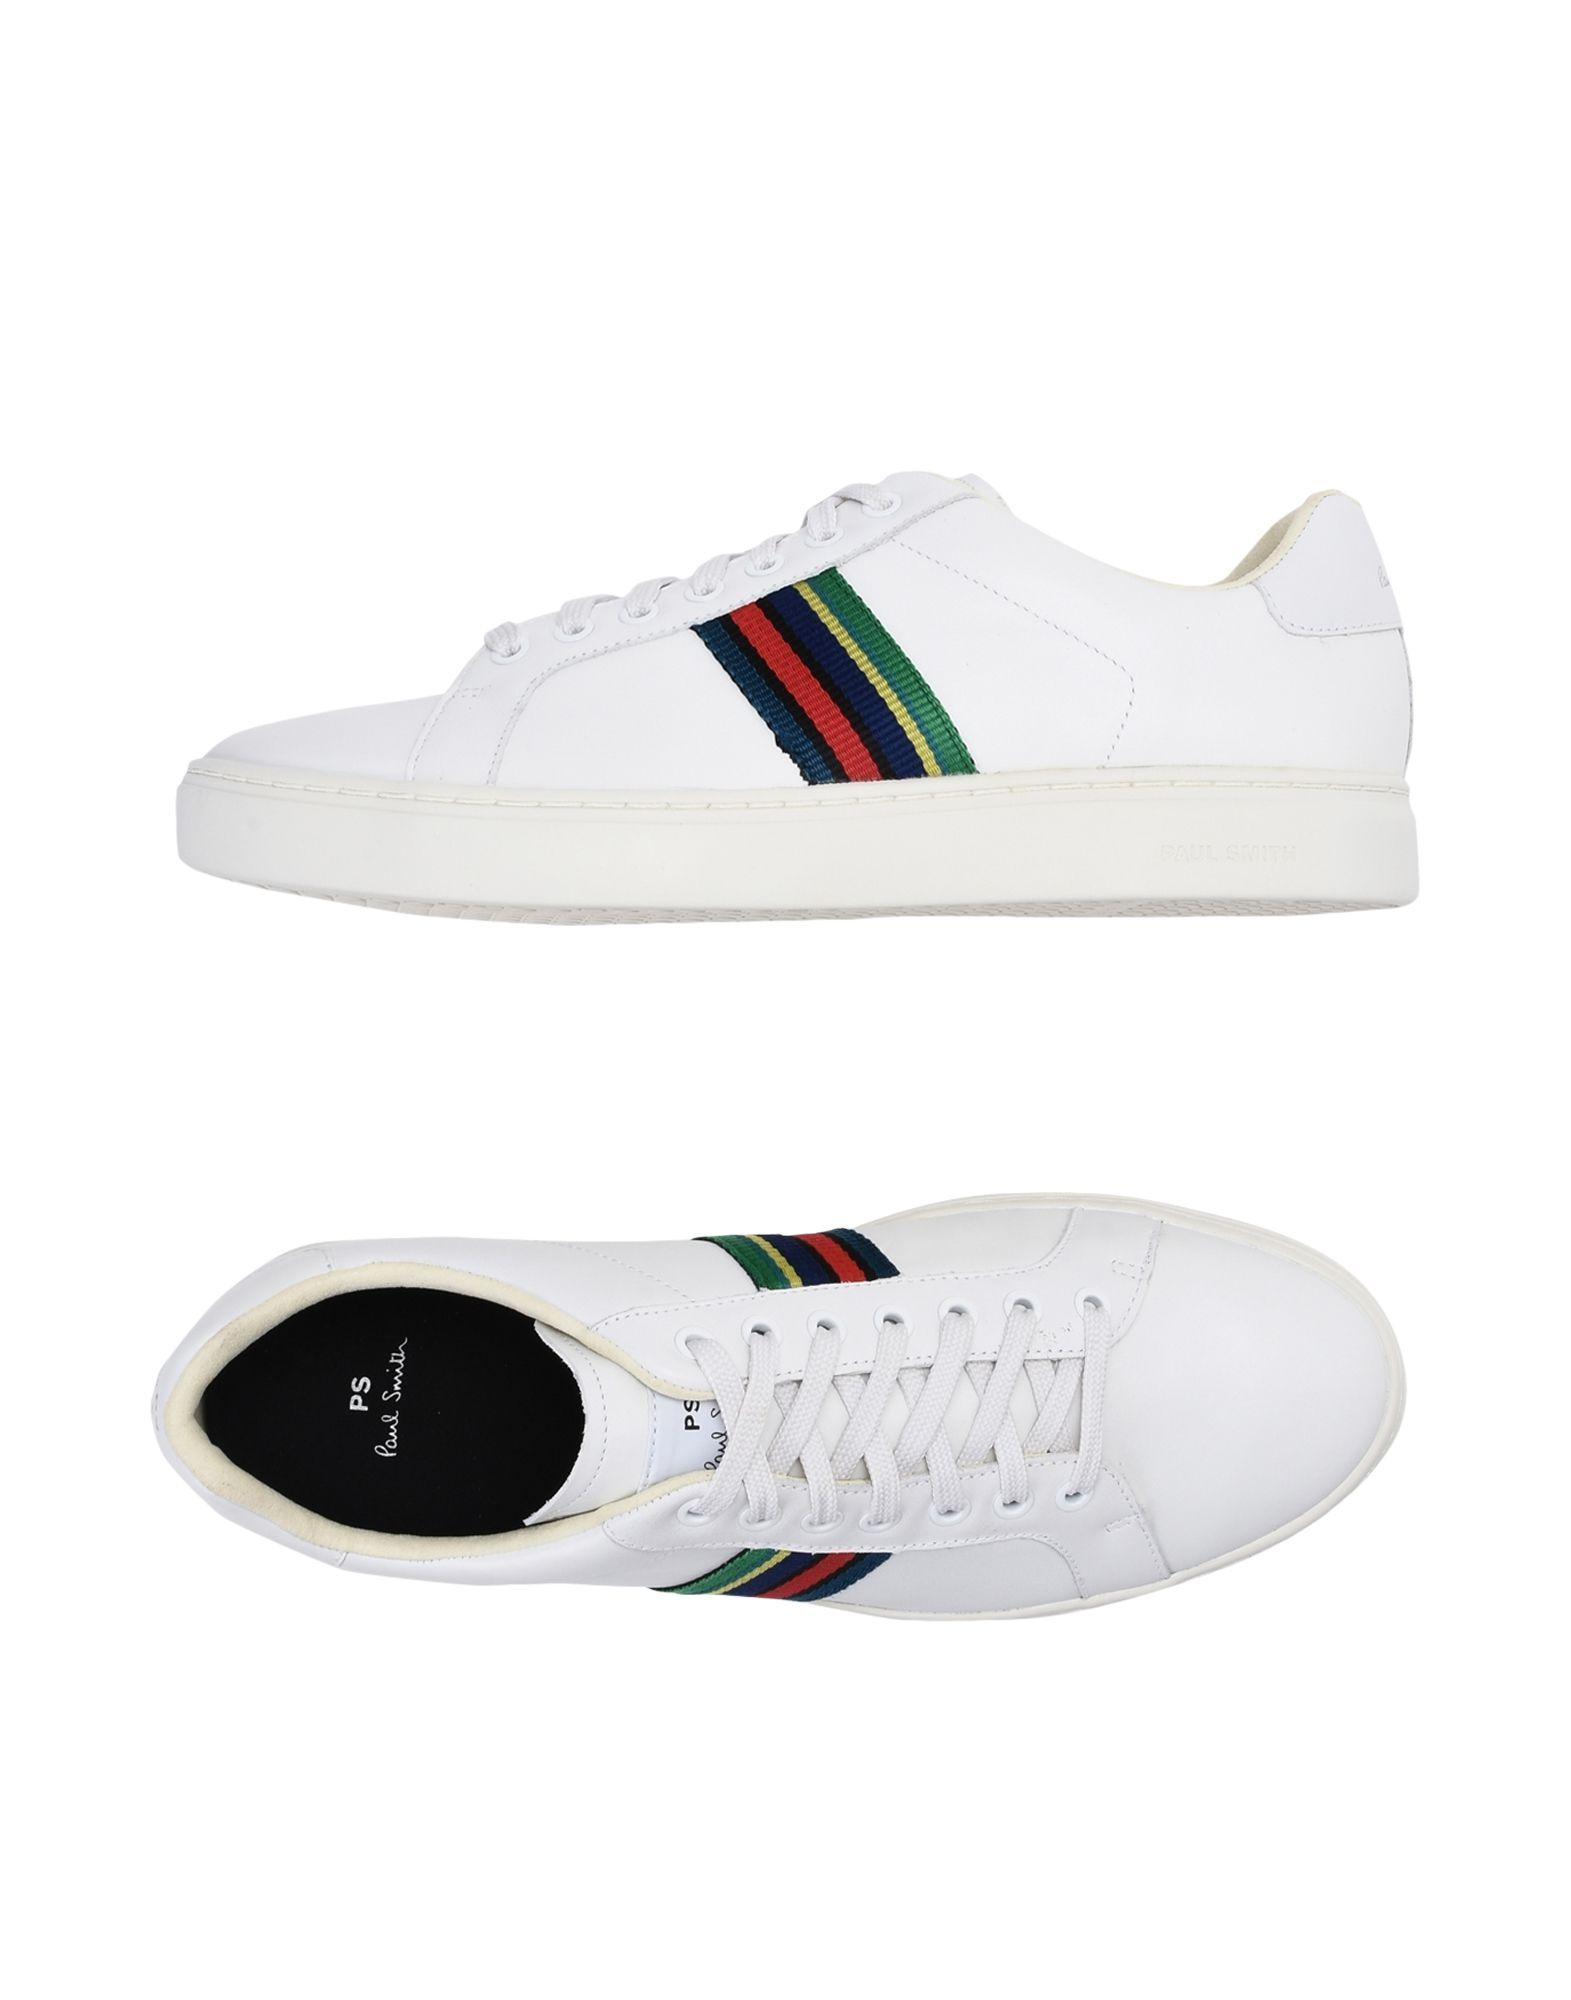 Ps By Paul Smith Mens Shoe Lapin White  11442034JO Gute Qualität beliebte Schuhe